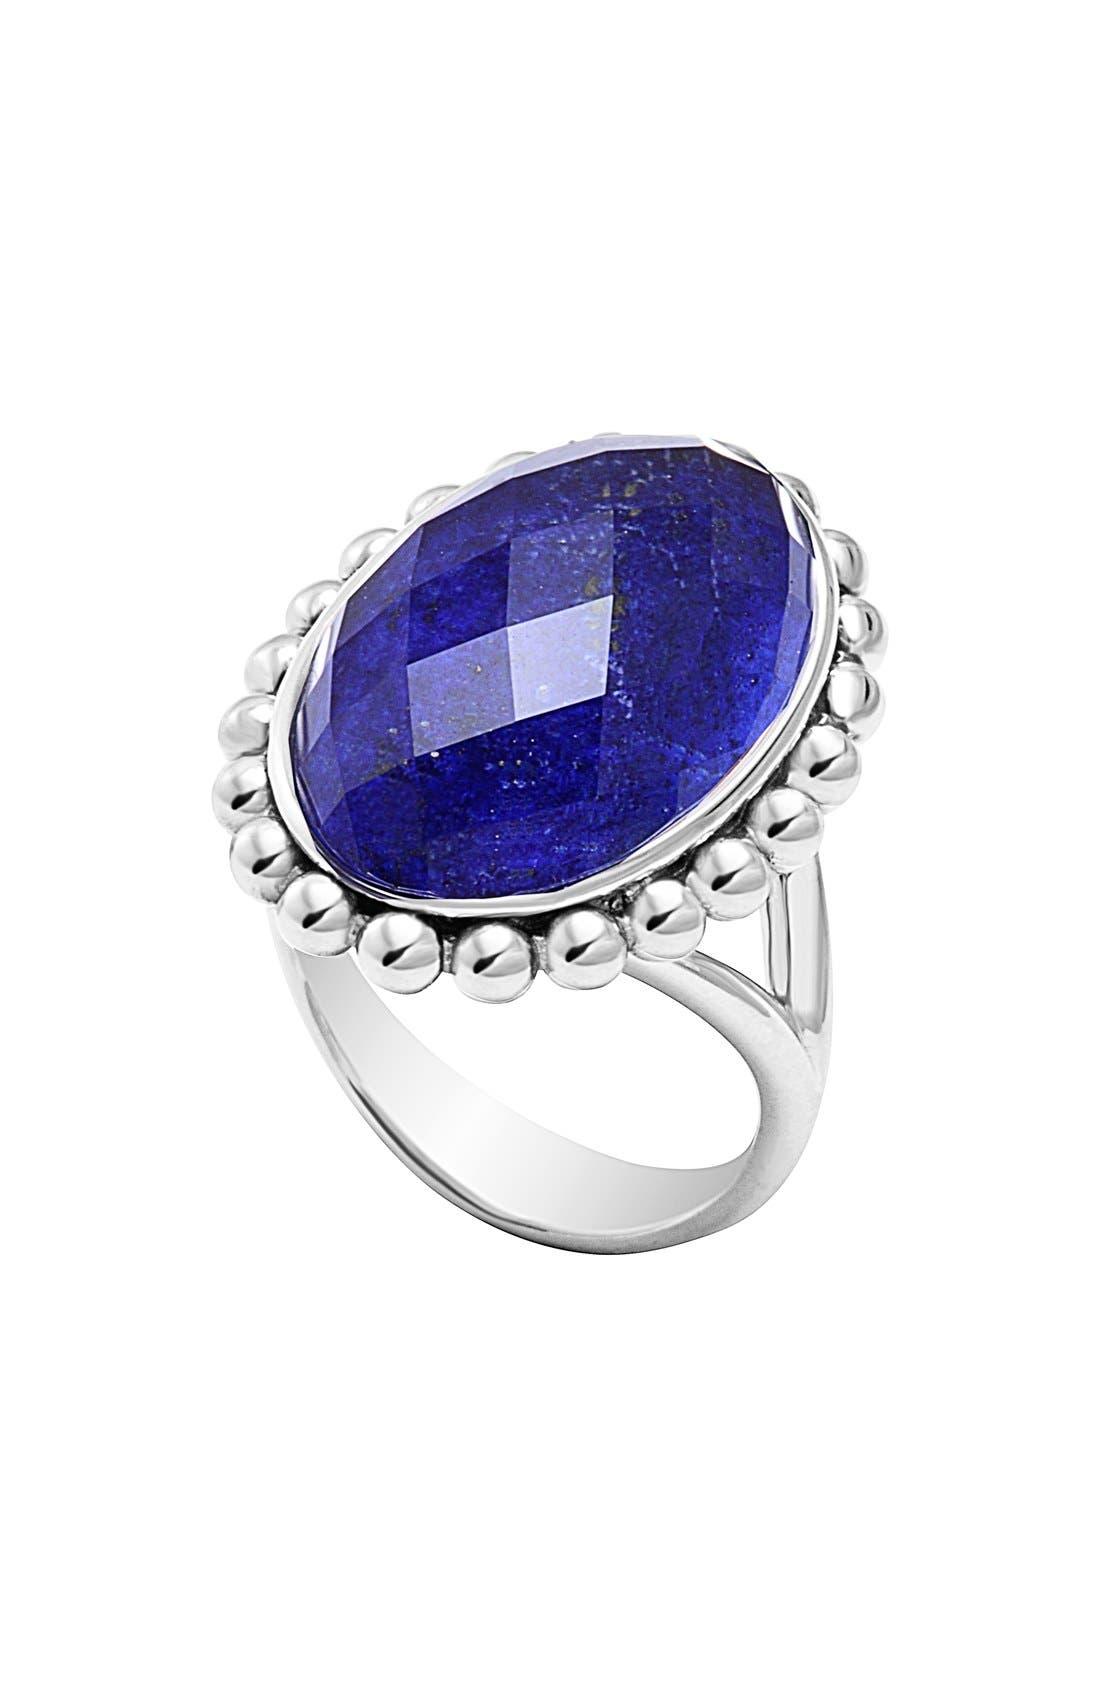 Main Image - LAGOS 'Maya' Oval Doublet Ring